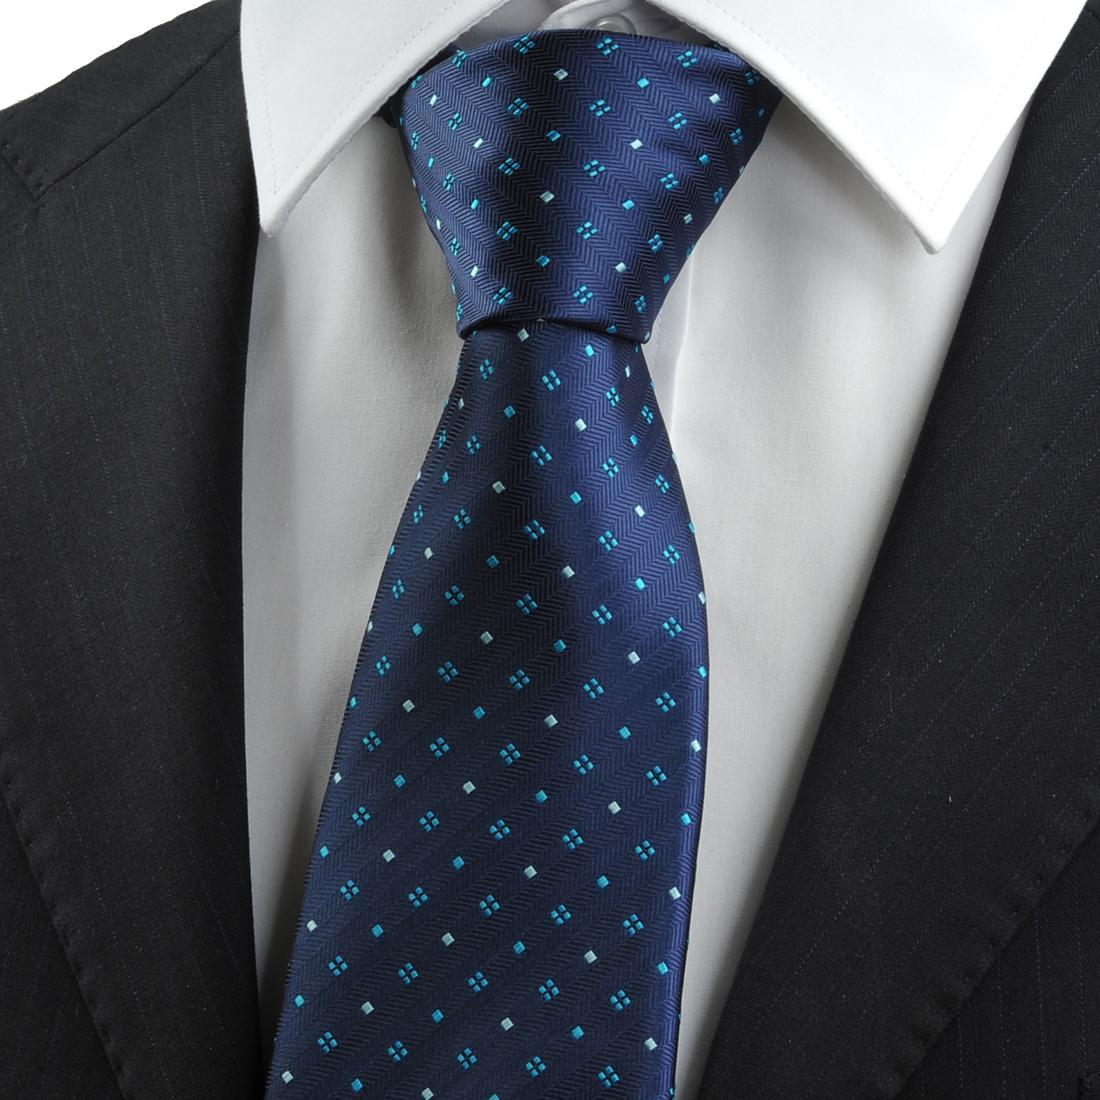 new tie modern design green checked pattern navy 8 5cm